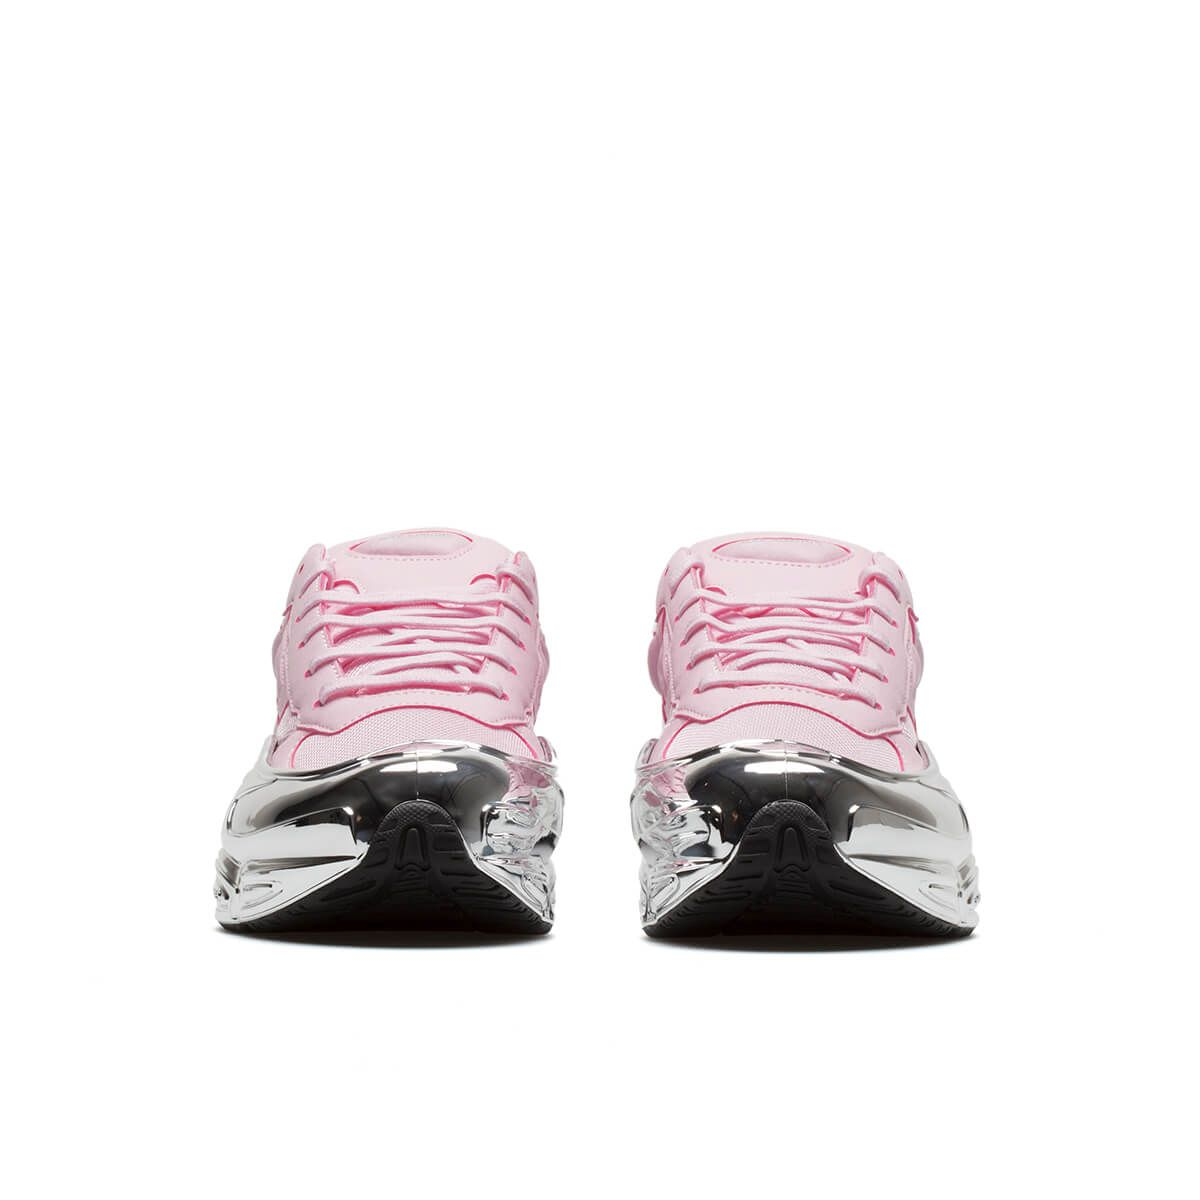 ff441b40c Adidas By Raf Simons Adidas By Raf Simons Ozweego Sneakers - Pink ...